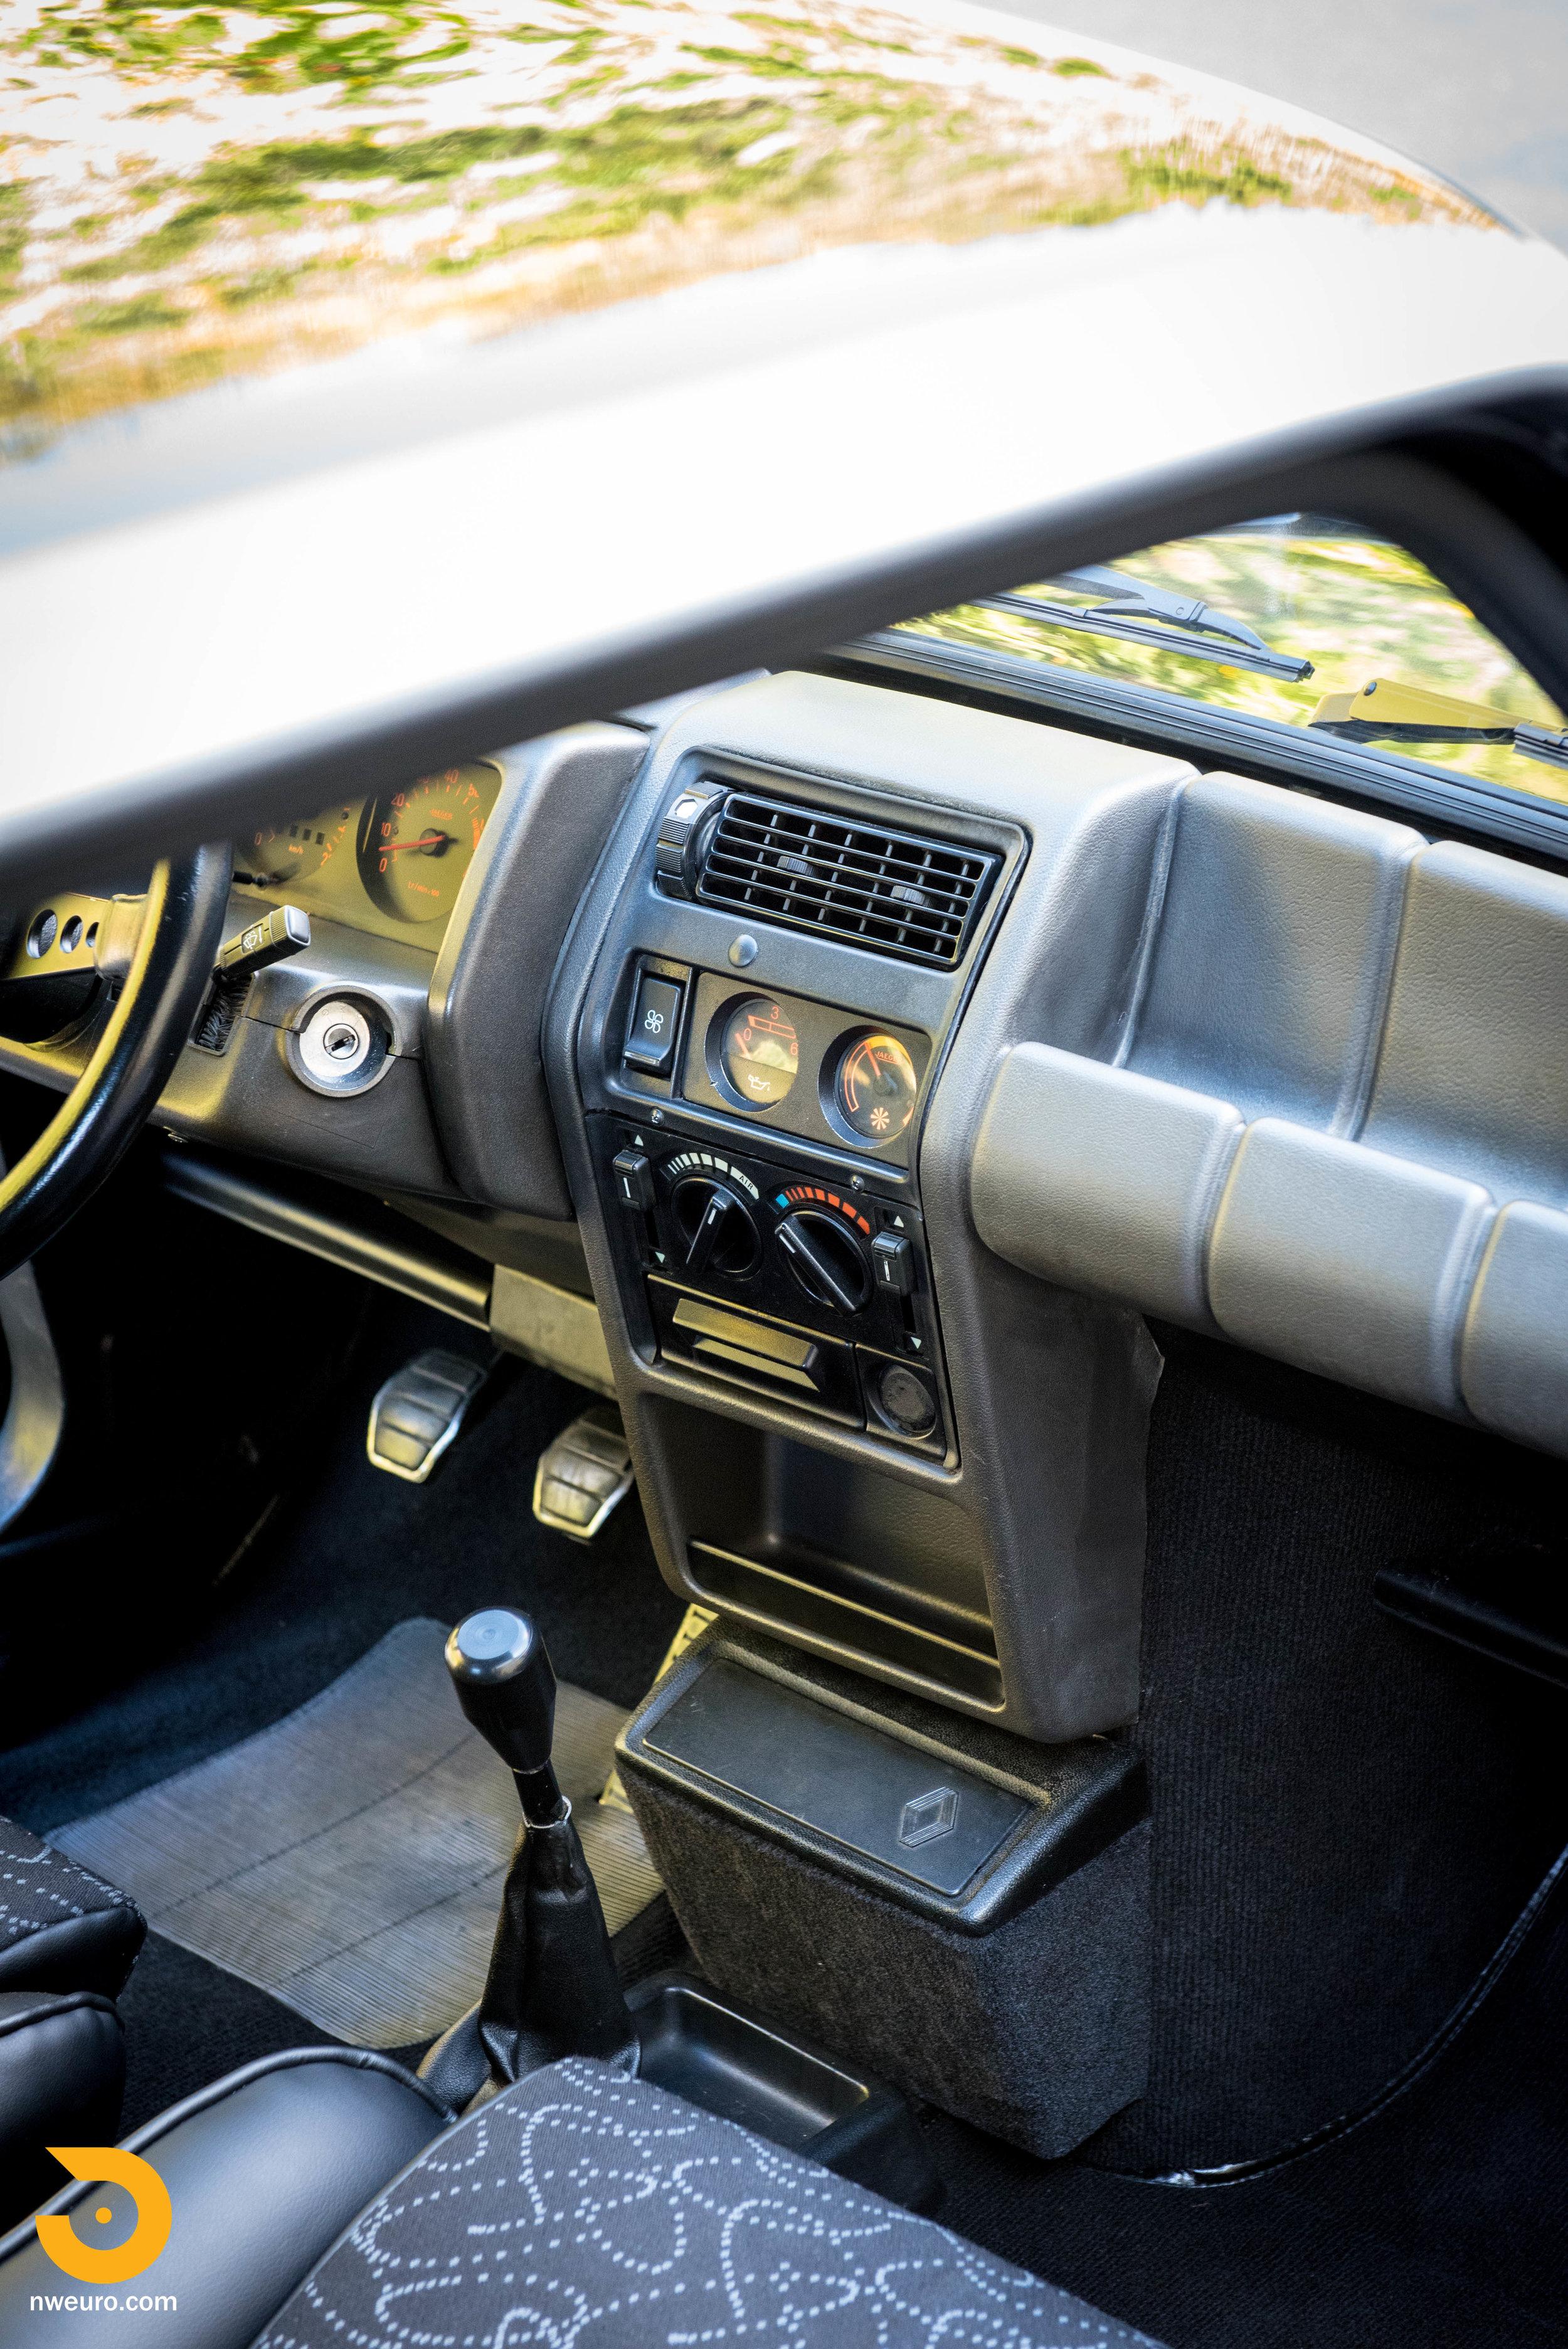 1983 Renault R5 Turbo 2 Black-4.jpg